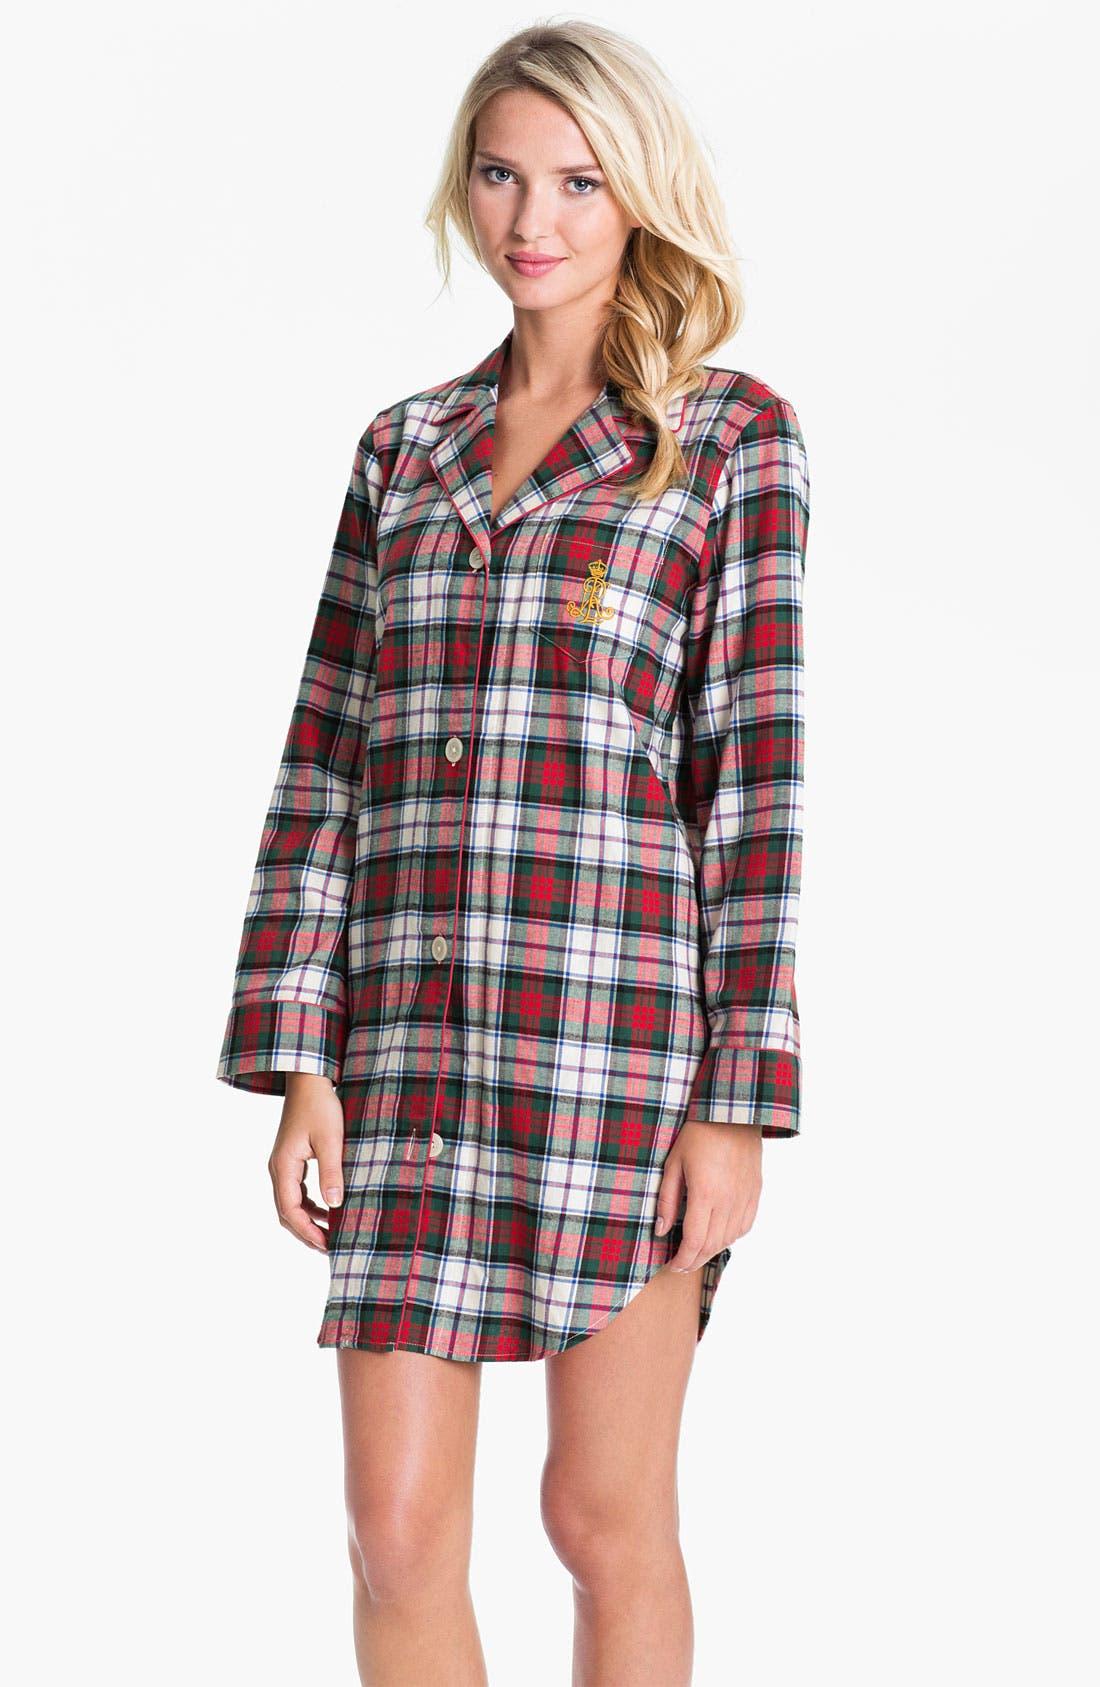 Alternate Image 1 Selected - Lauren Ralph Lauren Sleepwear Brushed Twill Nightshirt